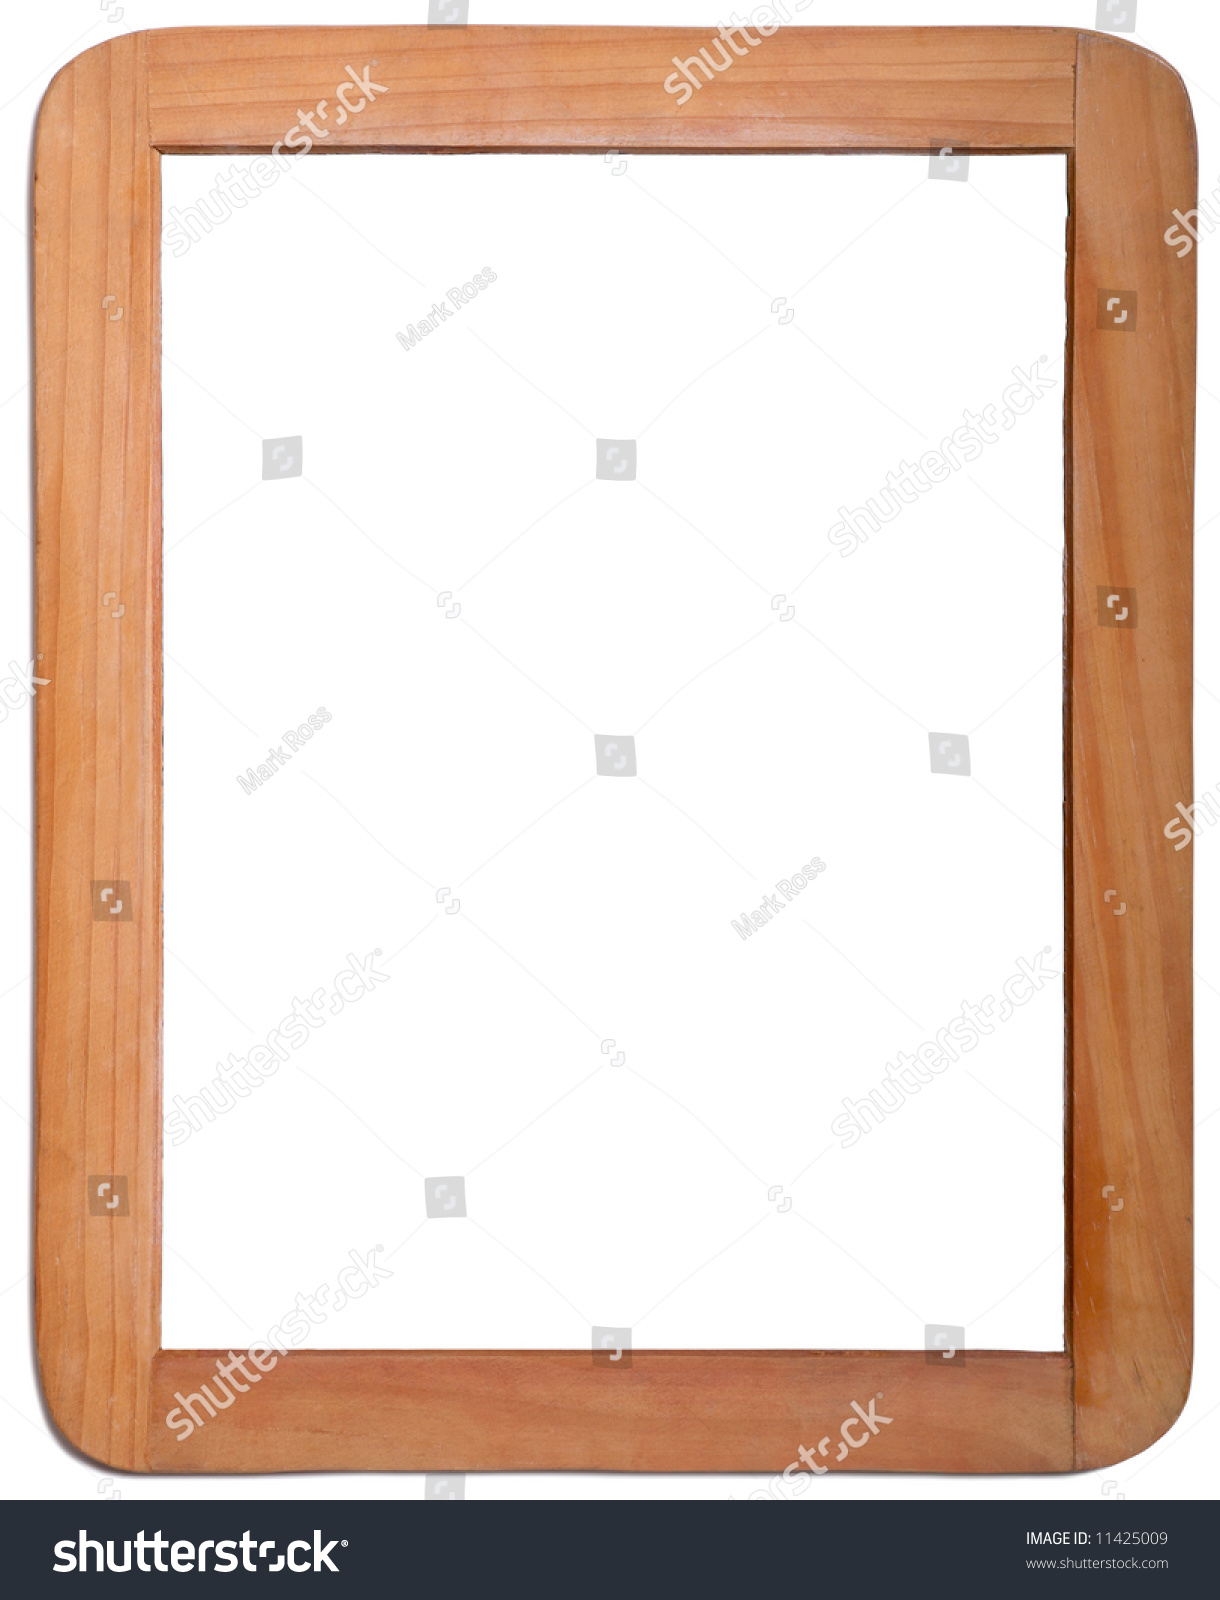 Whiteboard Wooden Frame On White Background Stock Photo & Image ...